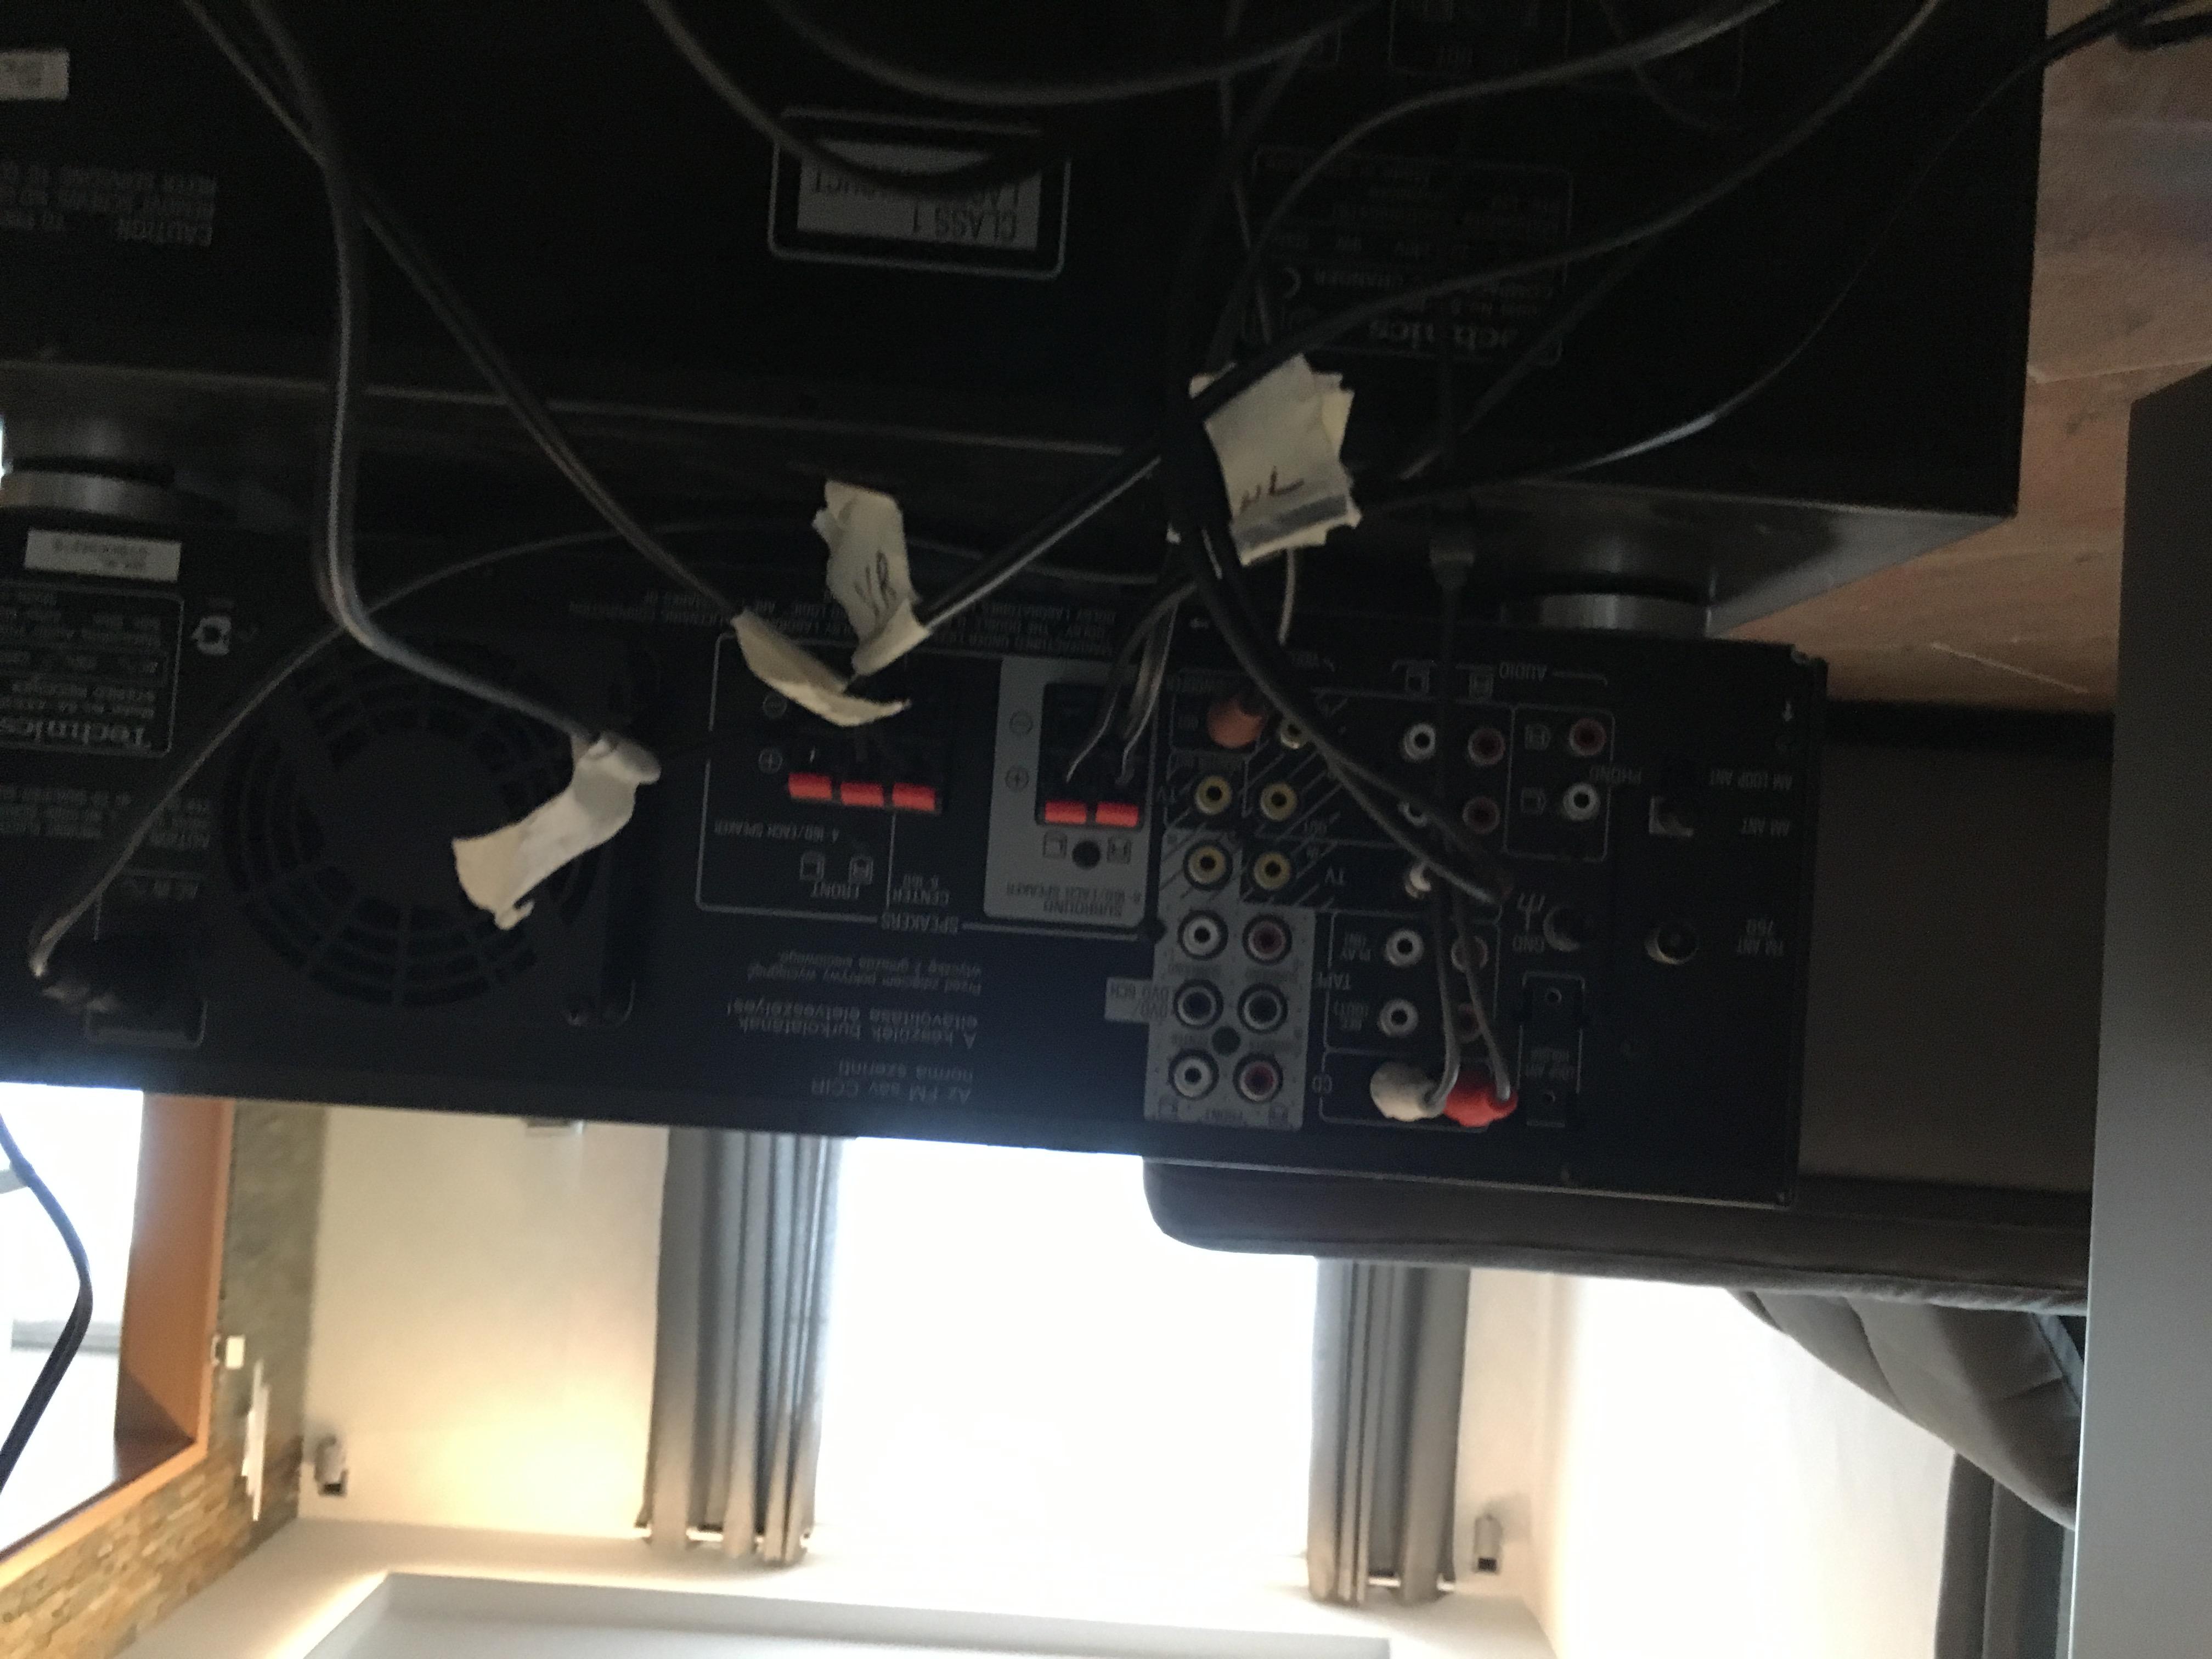 Verkabelung (Älterer) Verstärker - SKY Reciever - SmartTV (5.1 ...